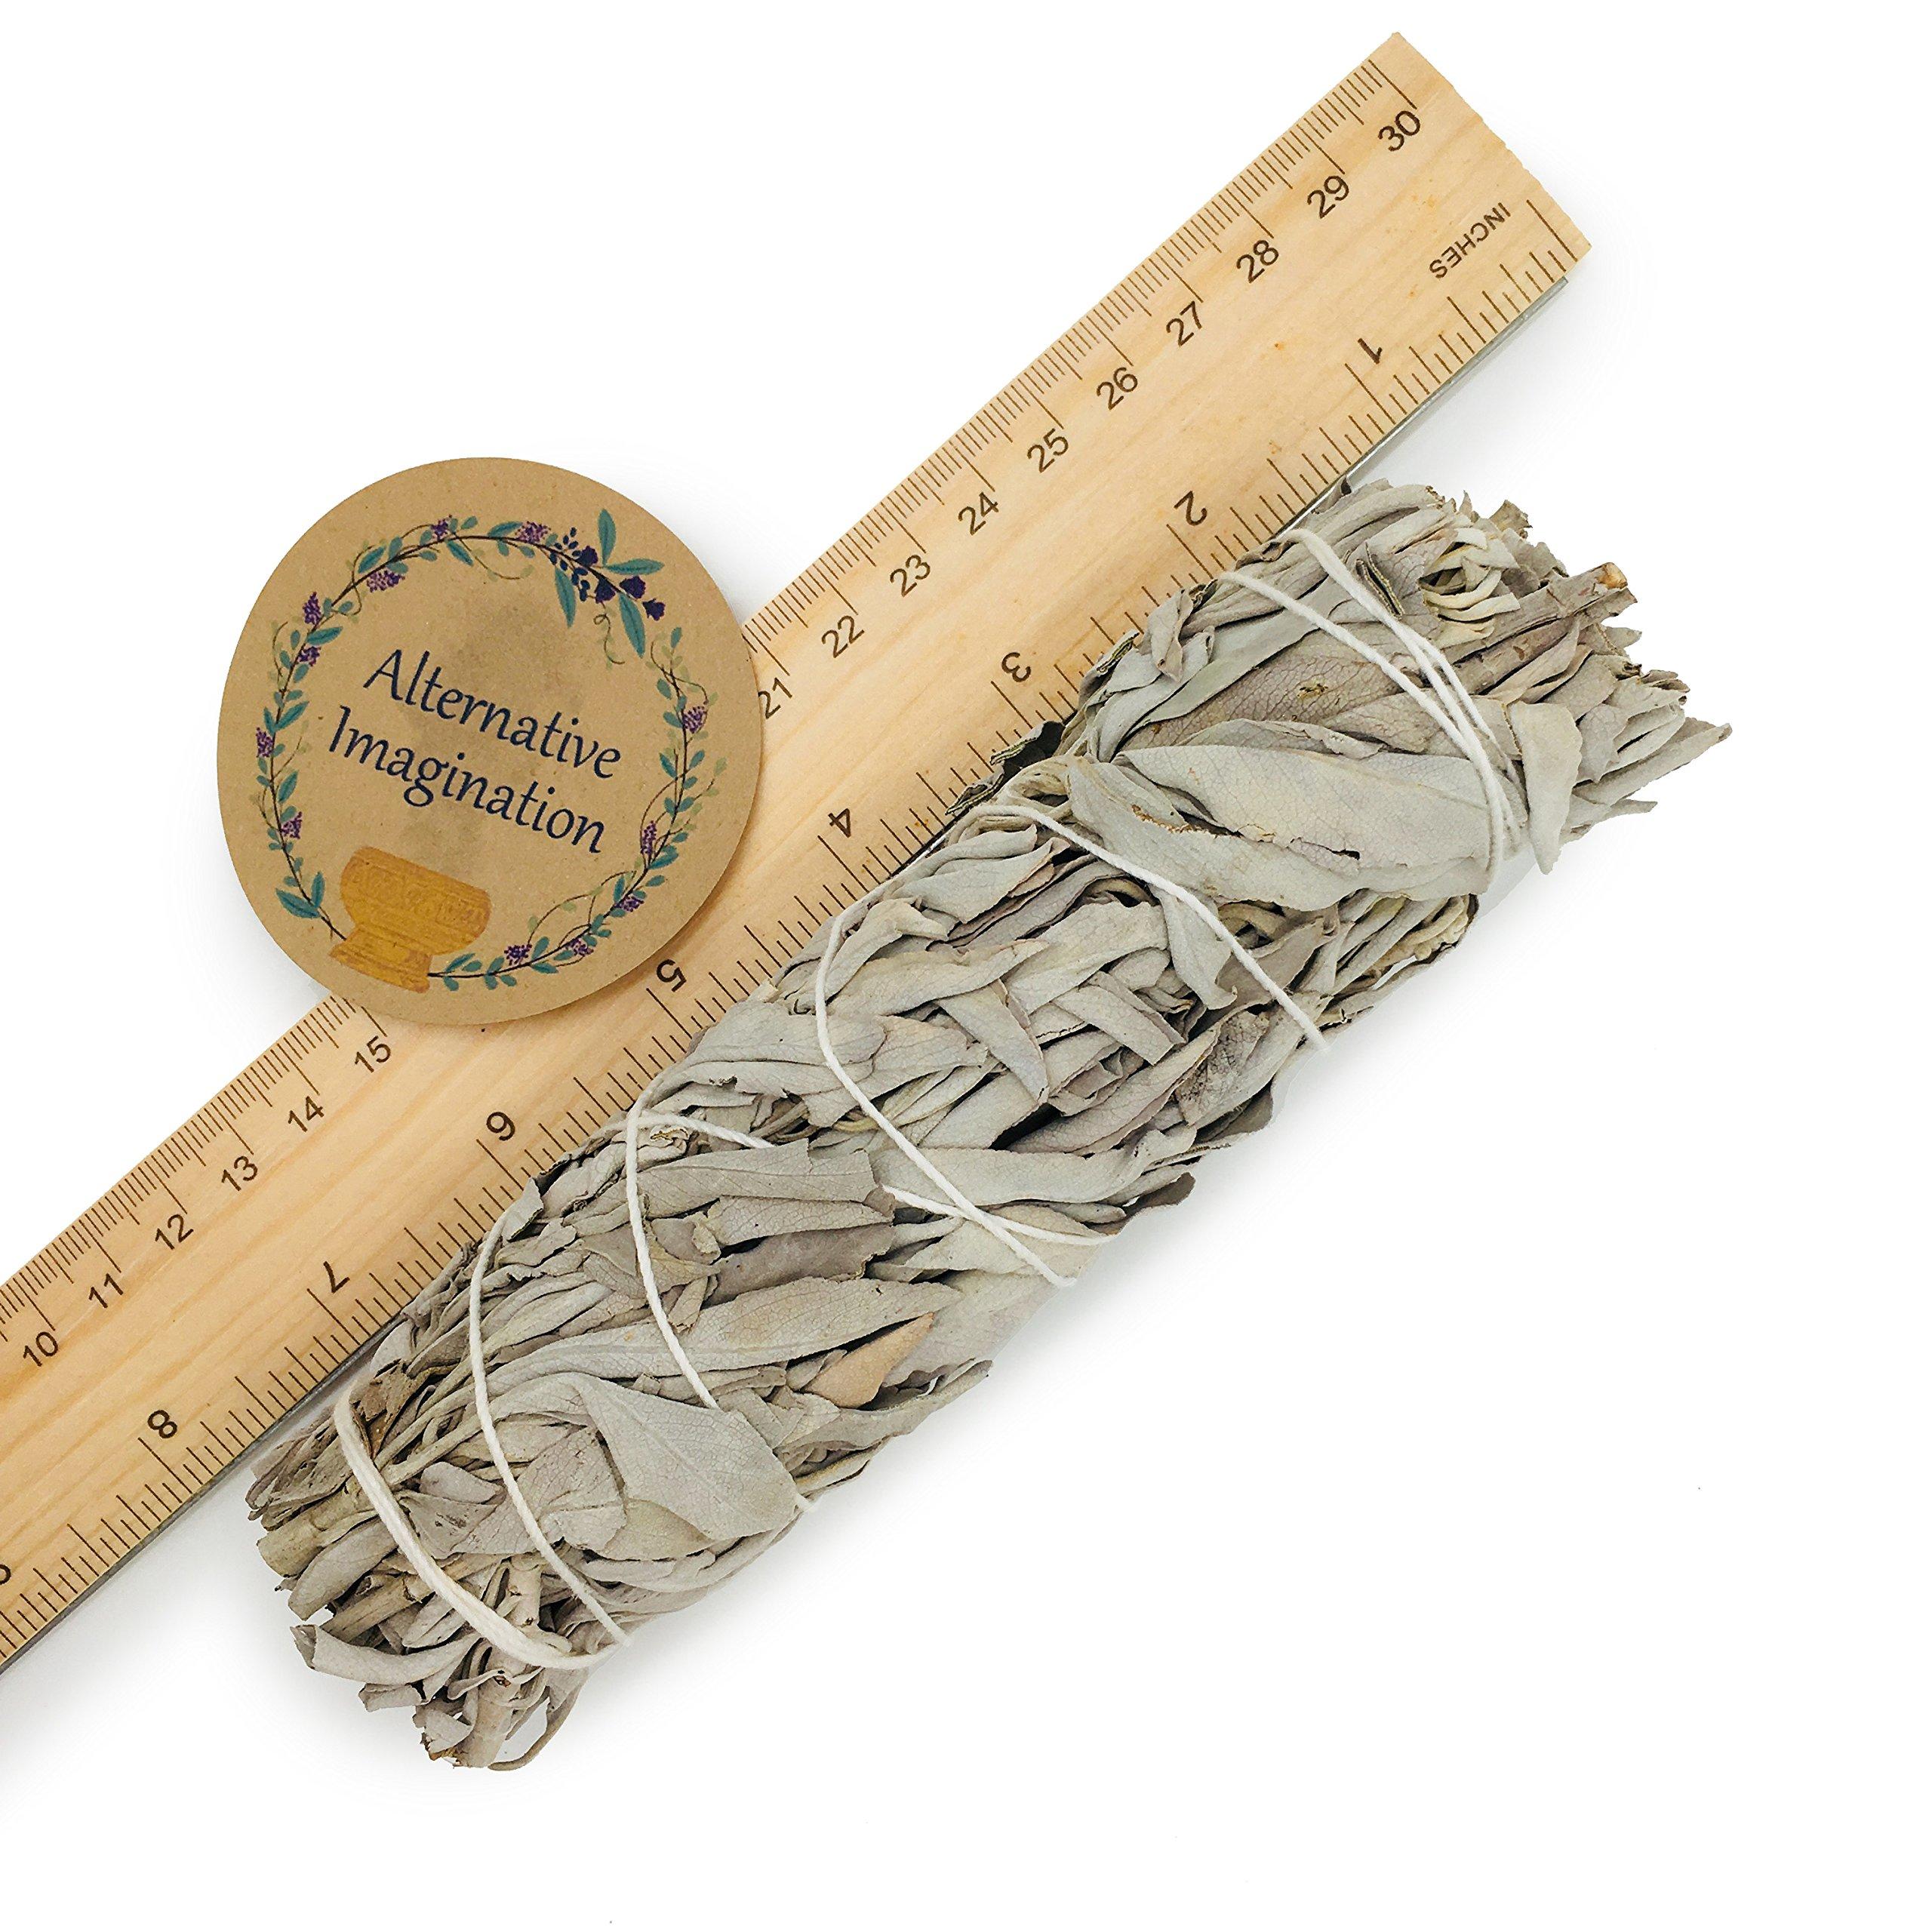 Alternative Imagination Premium California White Sage Smudge Sticks - 5 Inch Medium Sized - Package of 3 by Alternative Imagination (Image #5)